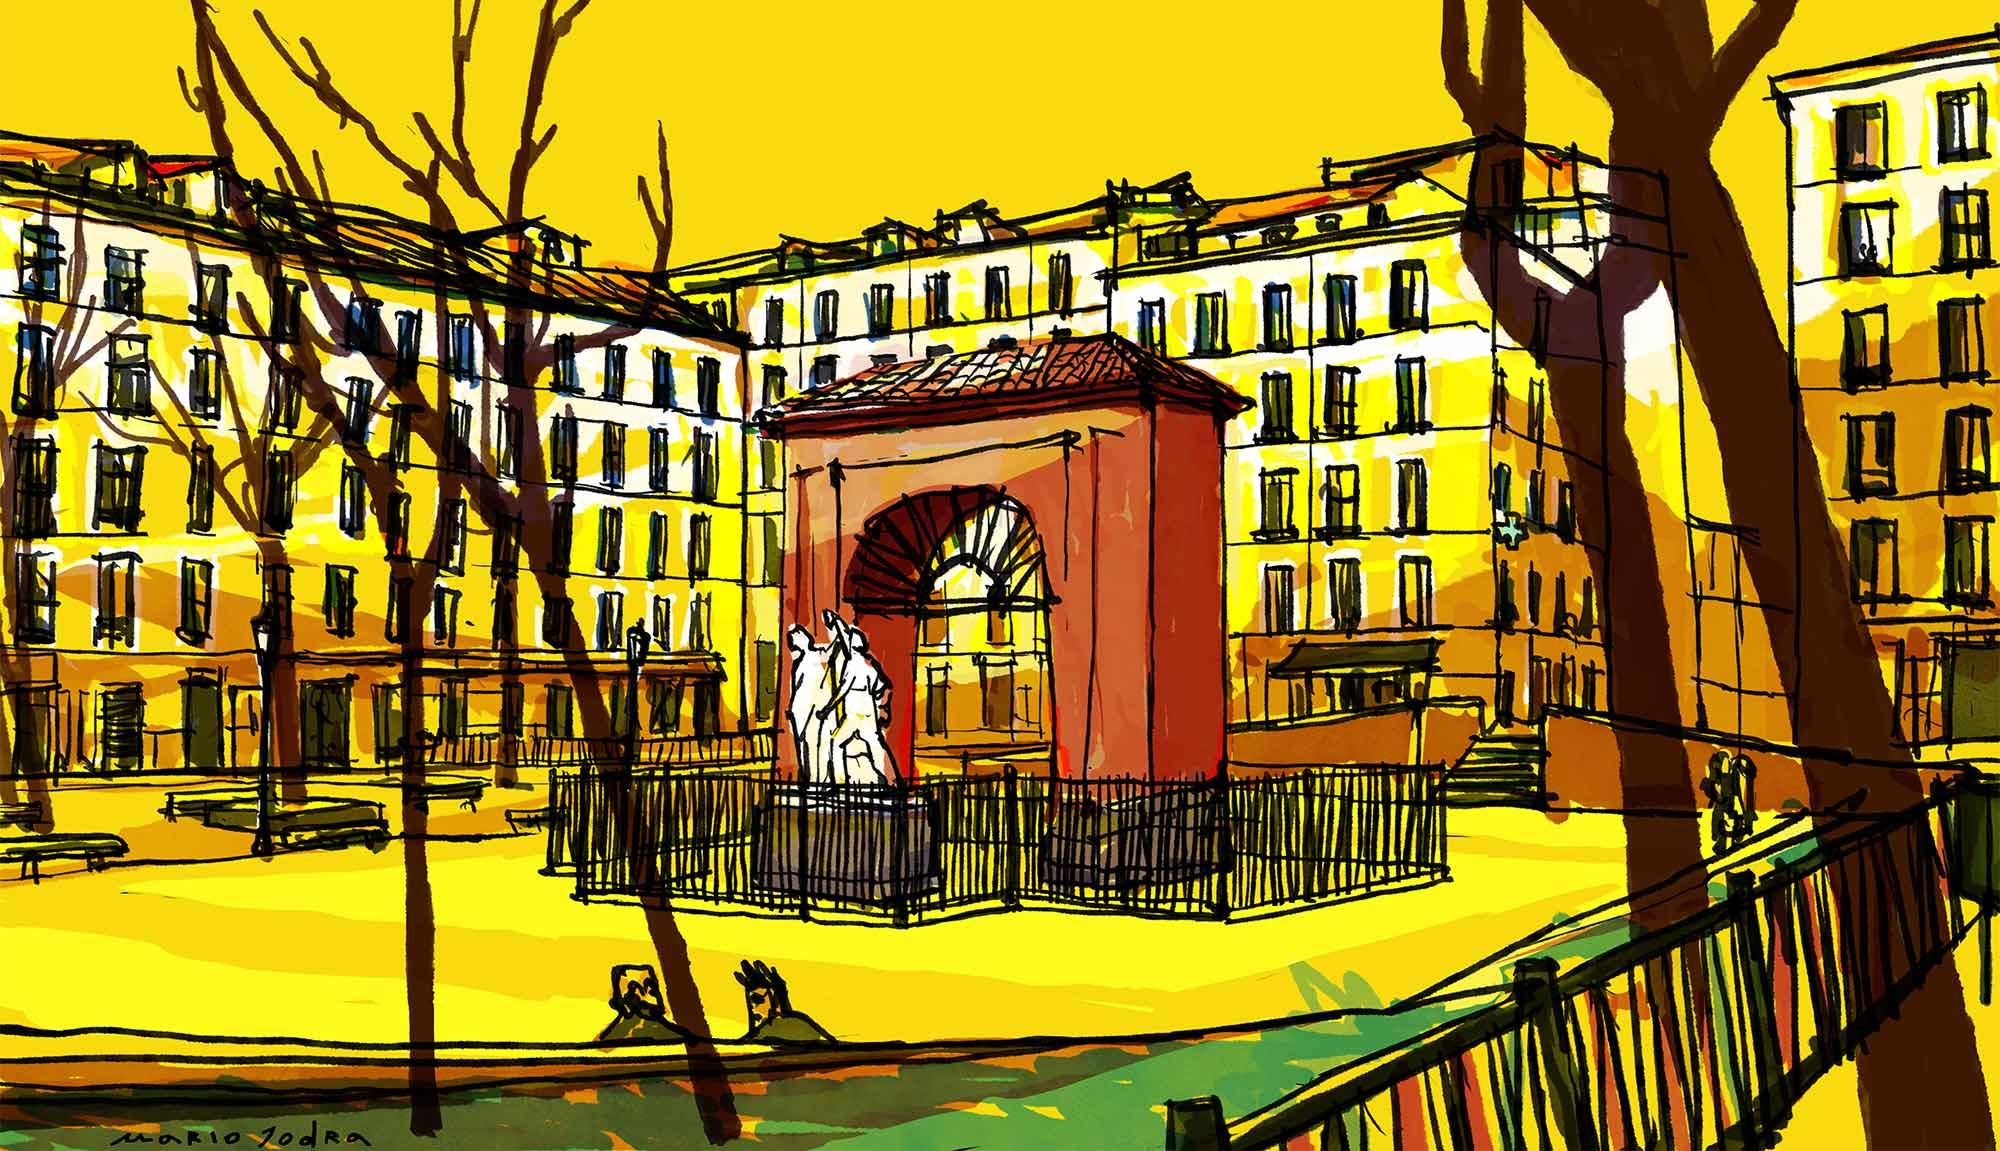 Mario Jodra illustration - Plaza del Dos de Mayo, Madrid